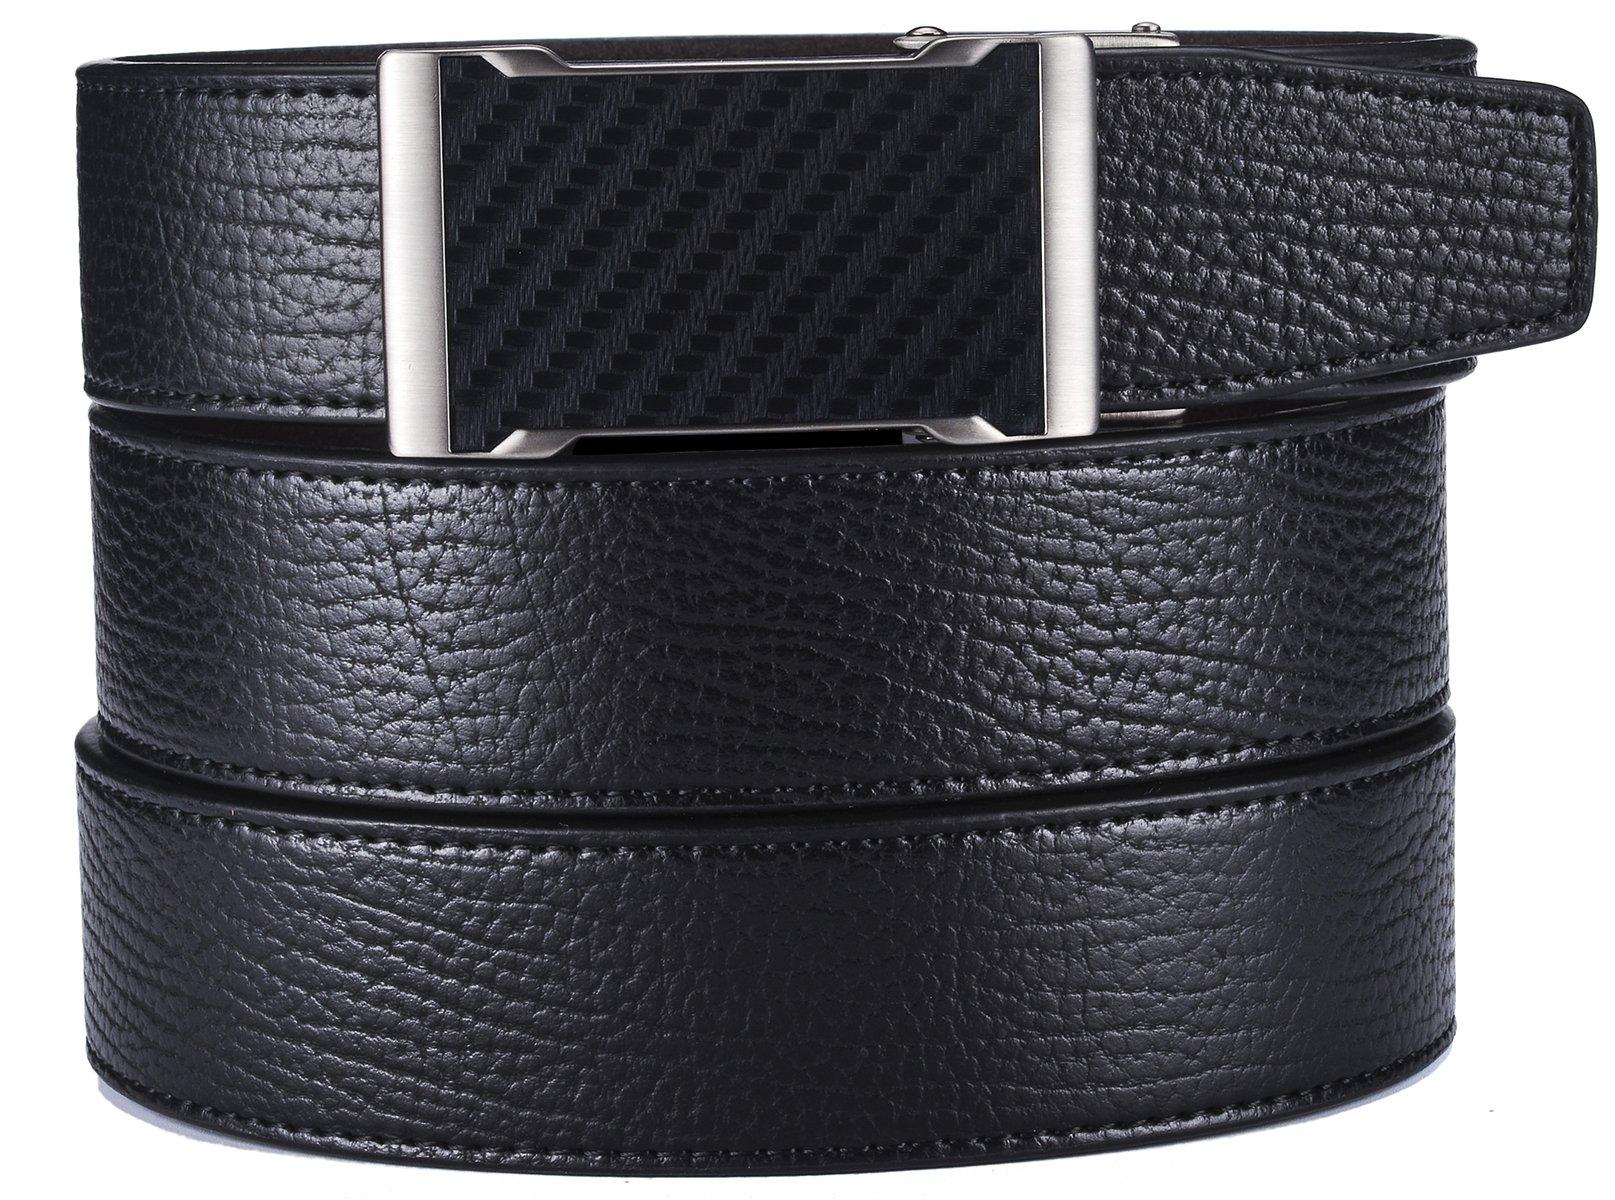 plyesxale Men's Leather Ratchet Dress Belt- Length is Adjustable - Delicate Gift Box (Waist Size:26-36'', Black Belt K124S10)